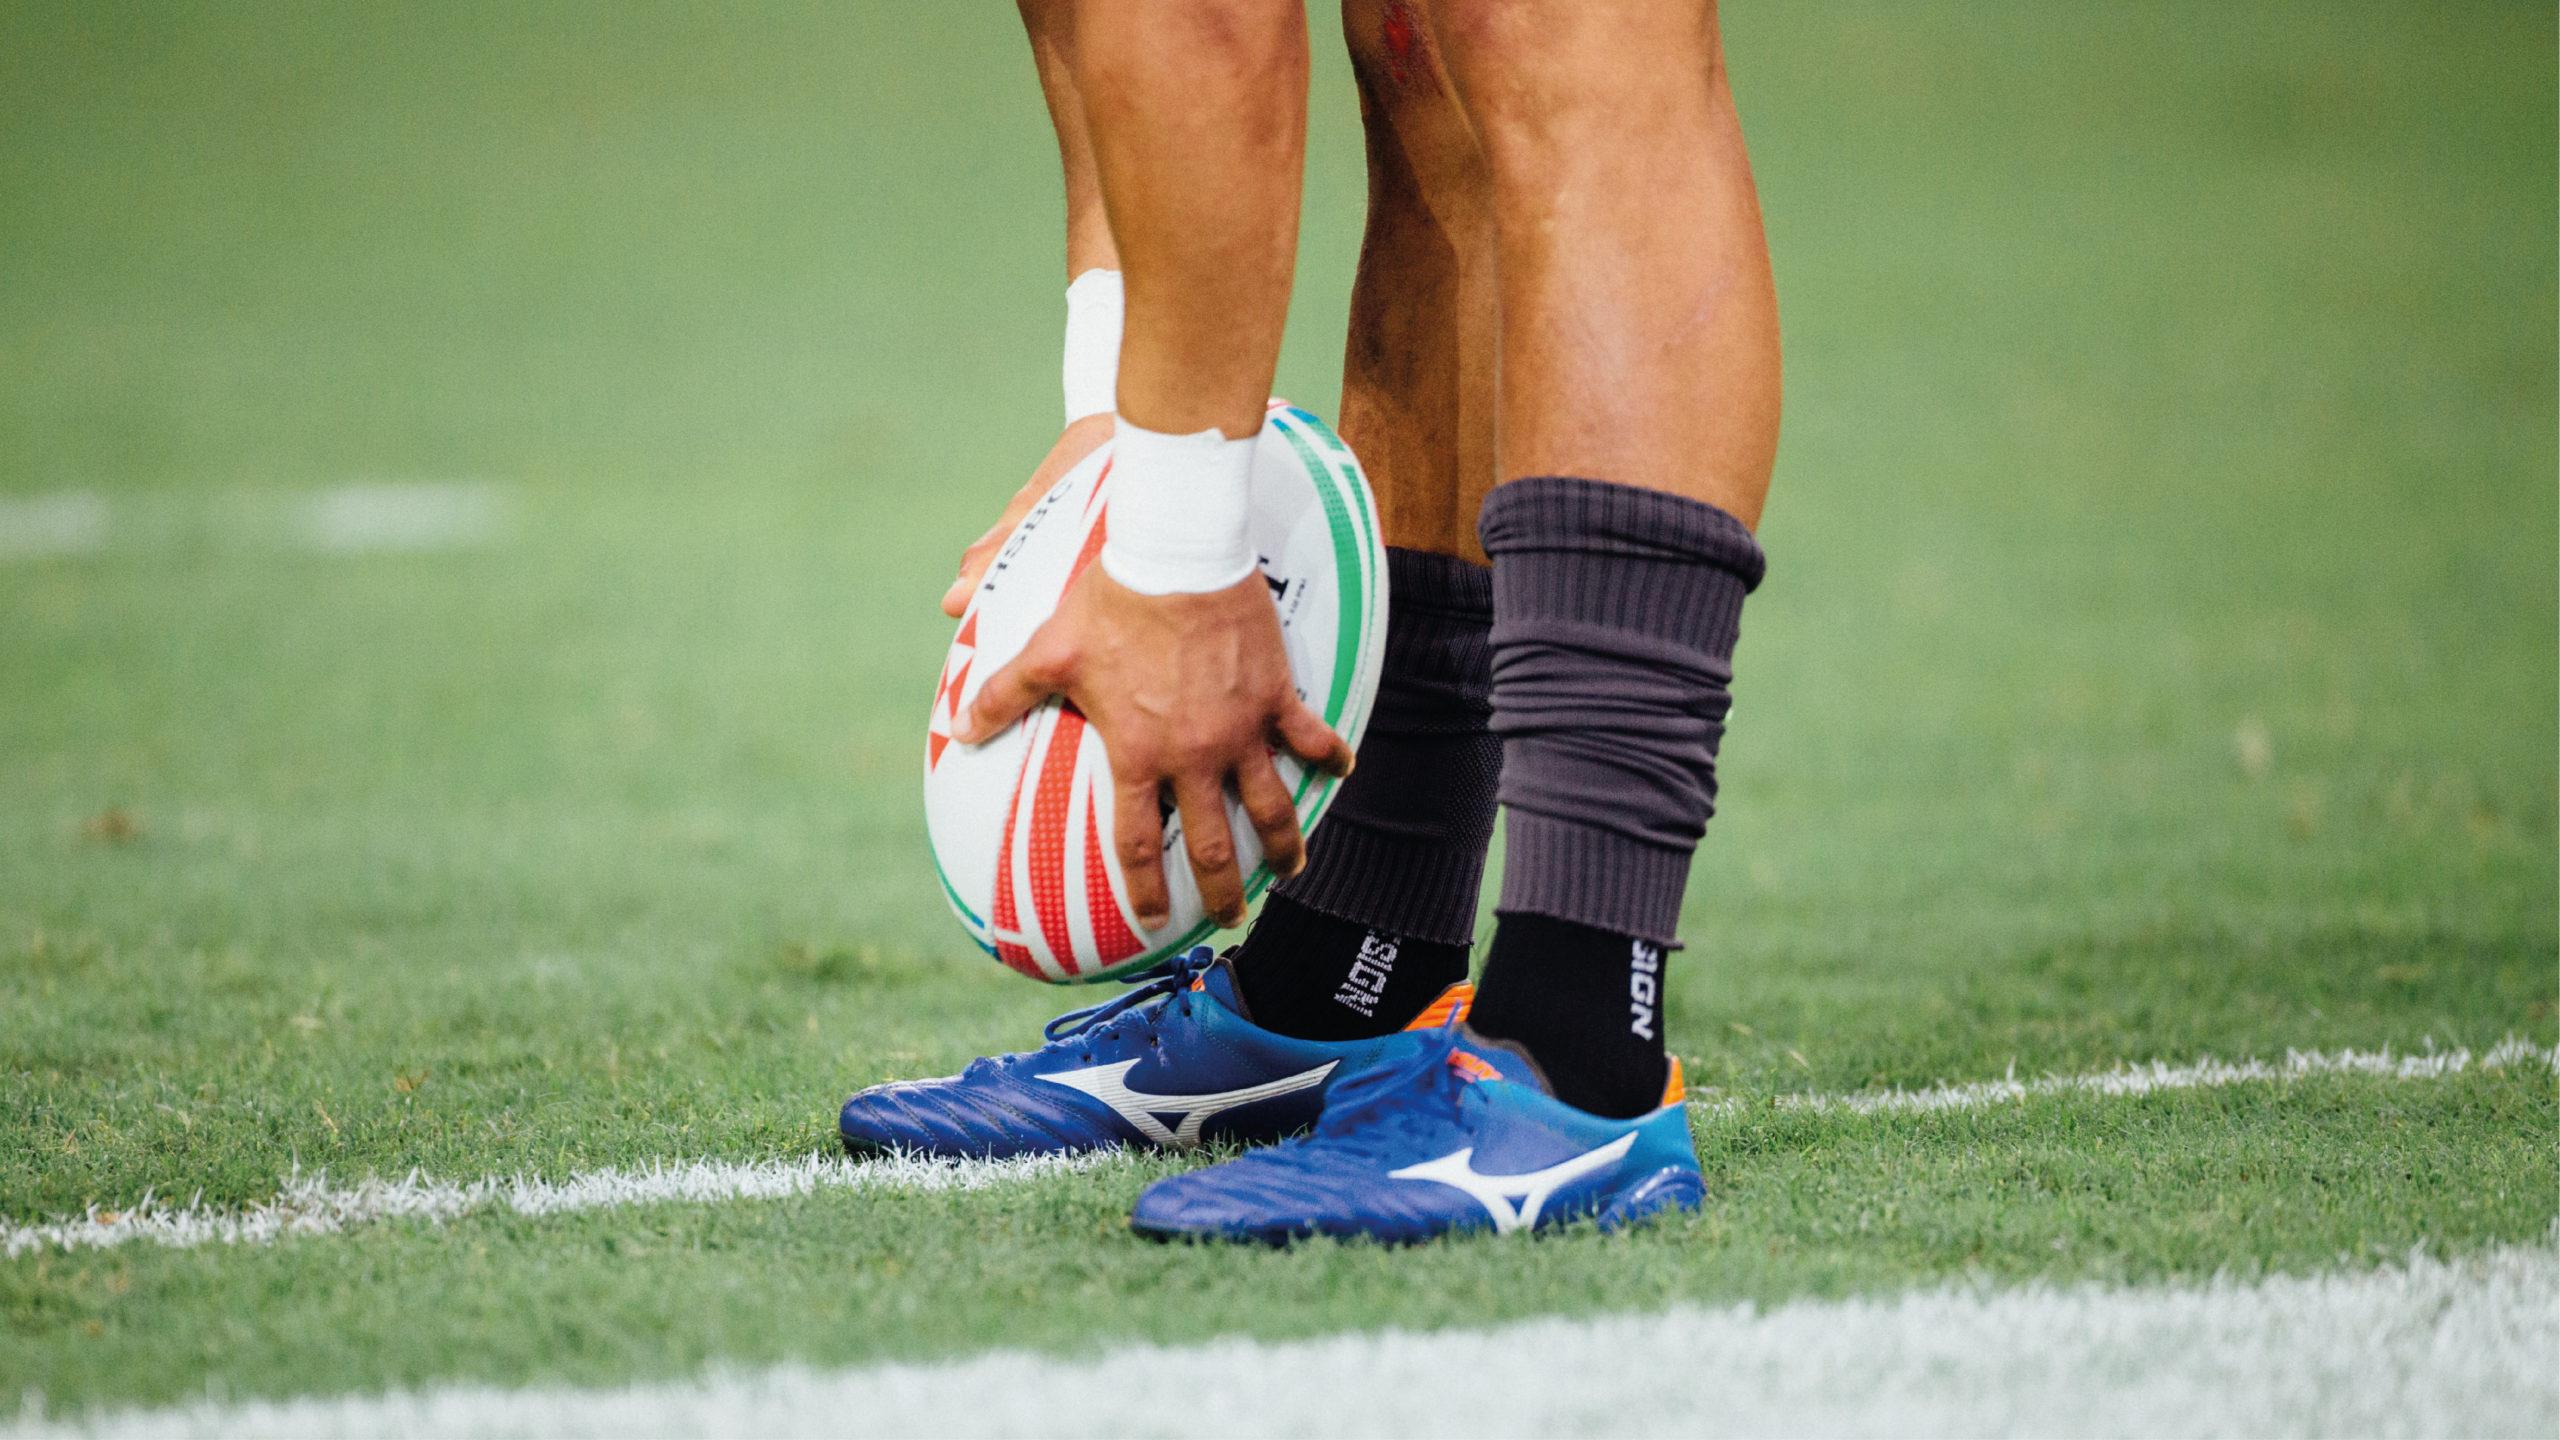 Mundial de rugby a XIII se pospone hasta 2022 por pandemia